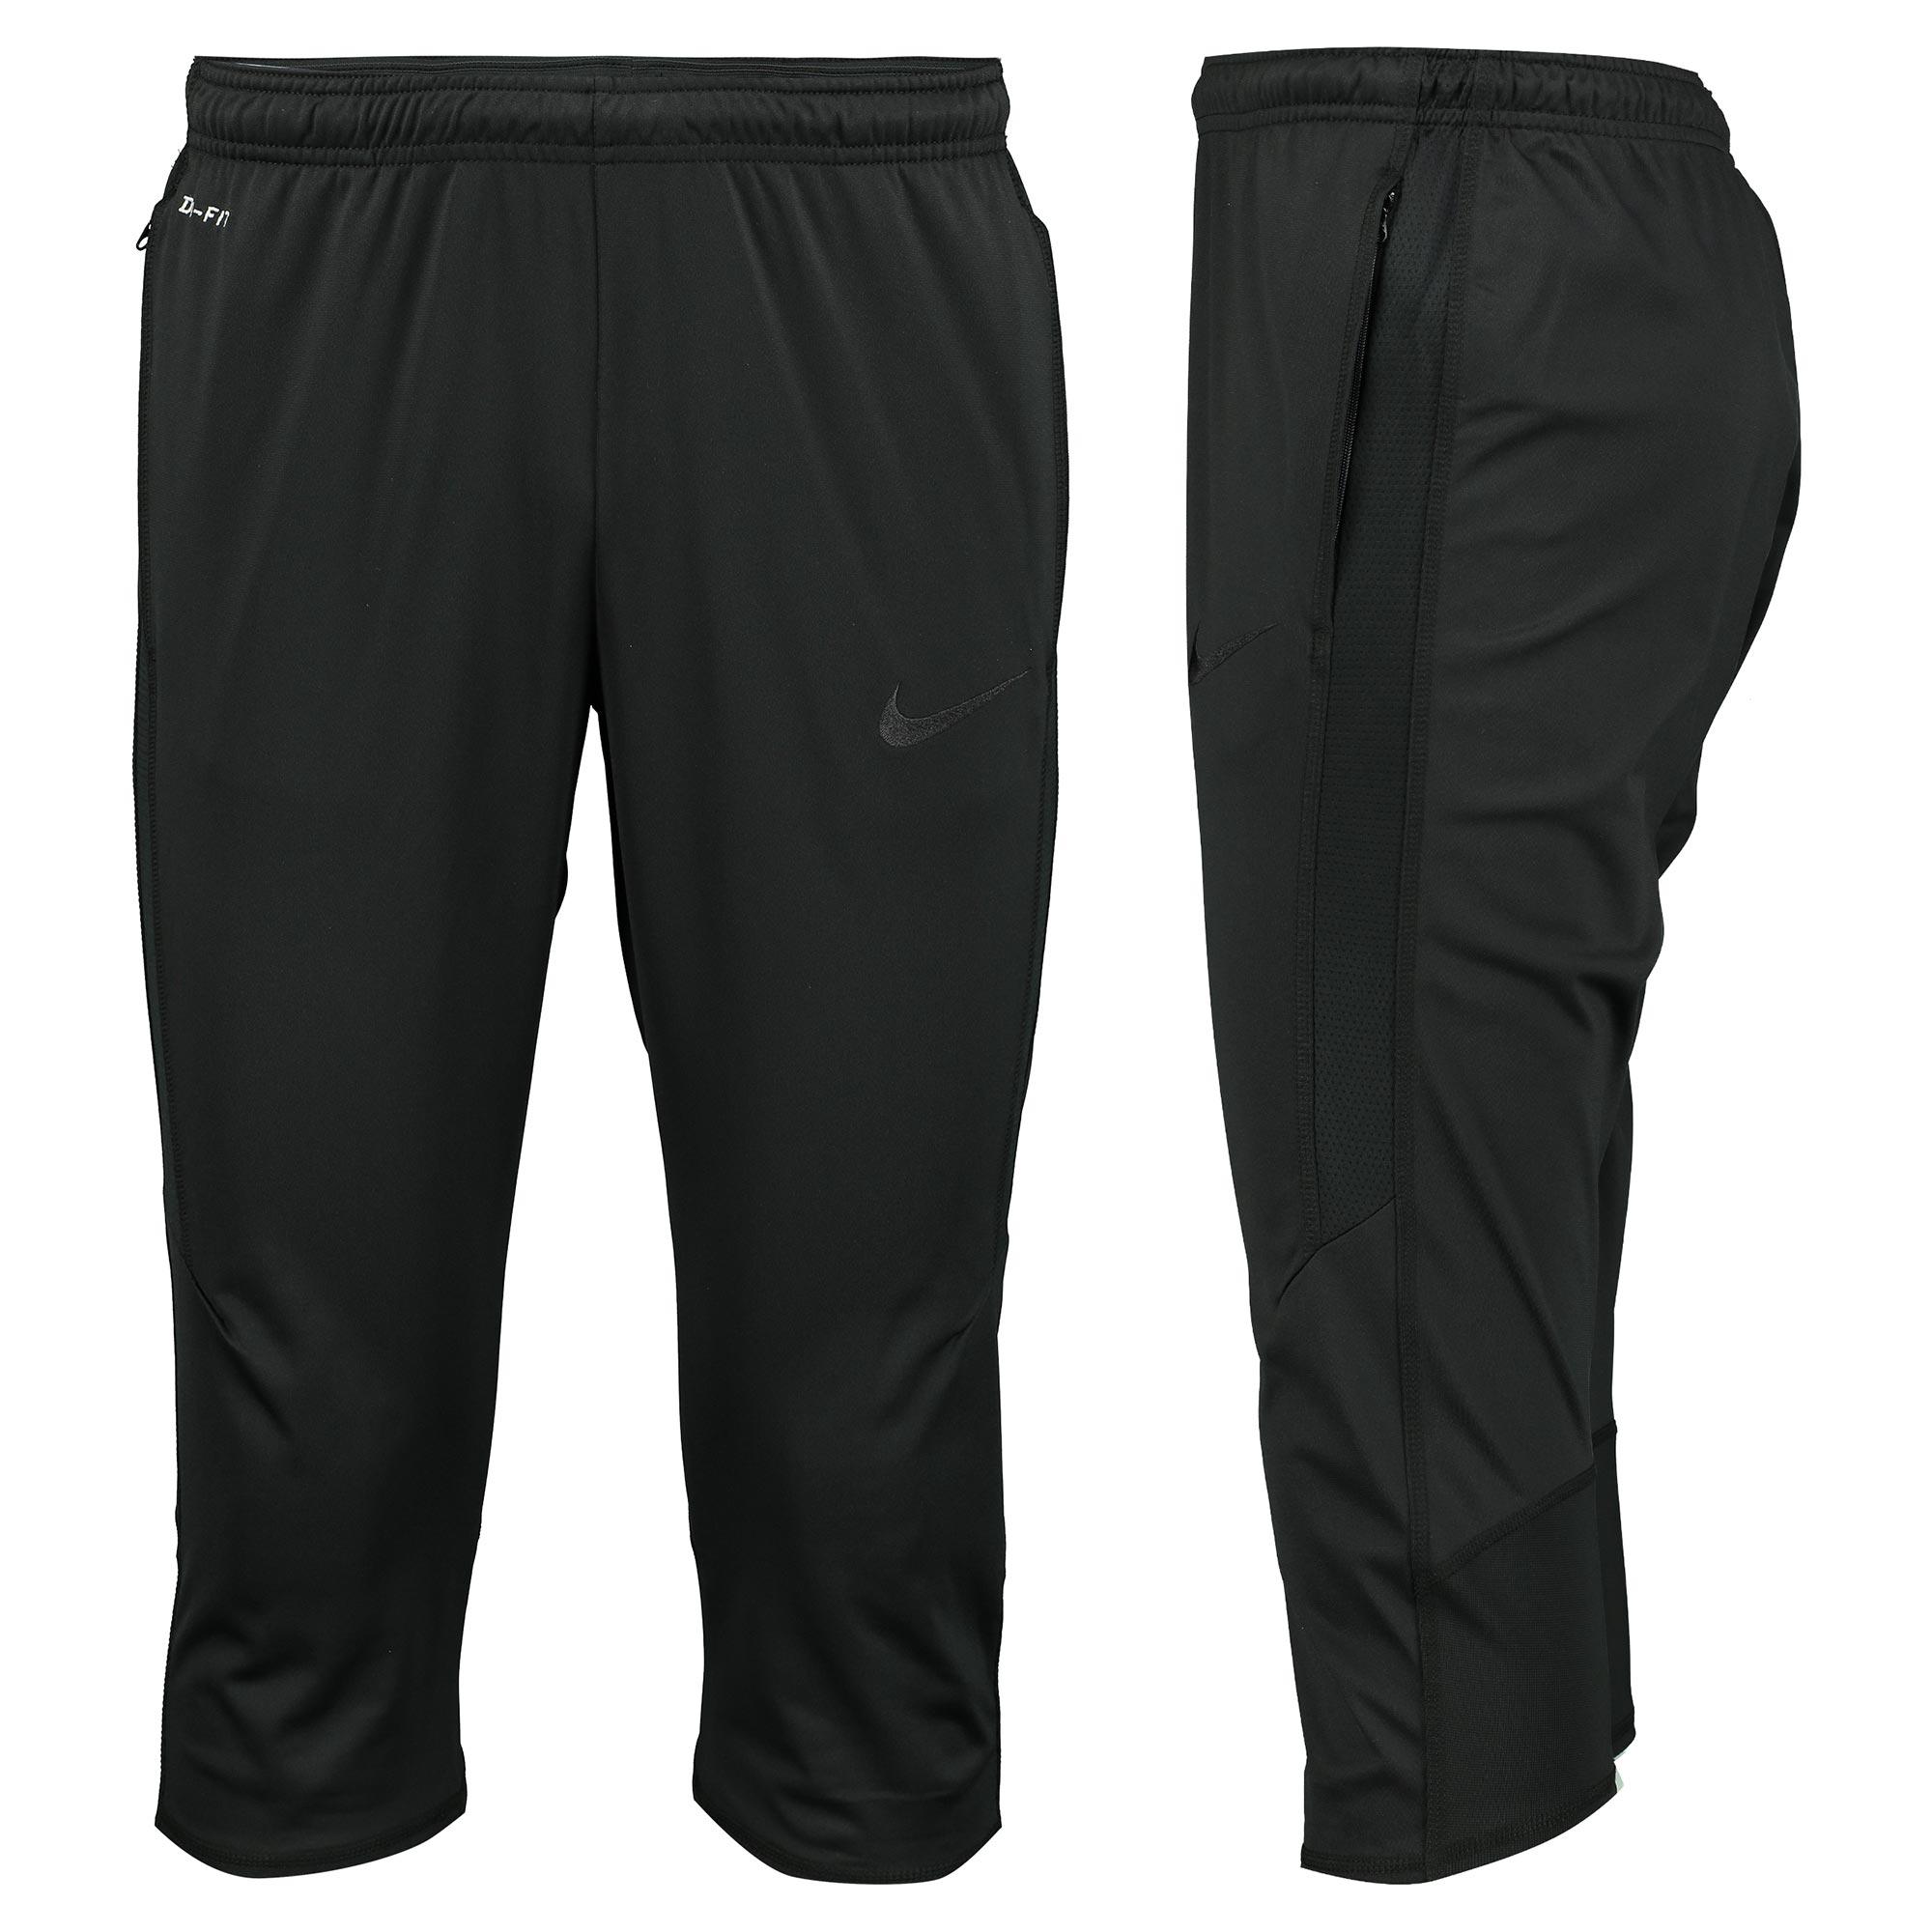 Nike Strike 3/4 Pants - Black/Black/Black/Black